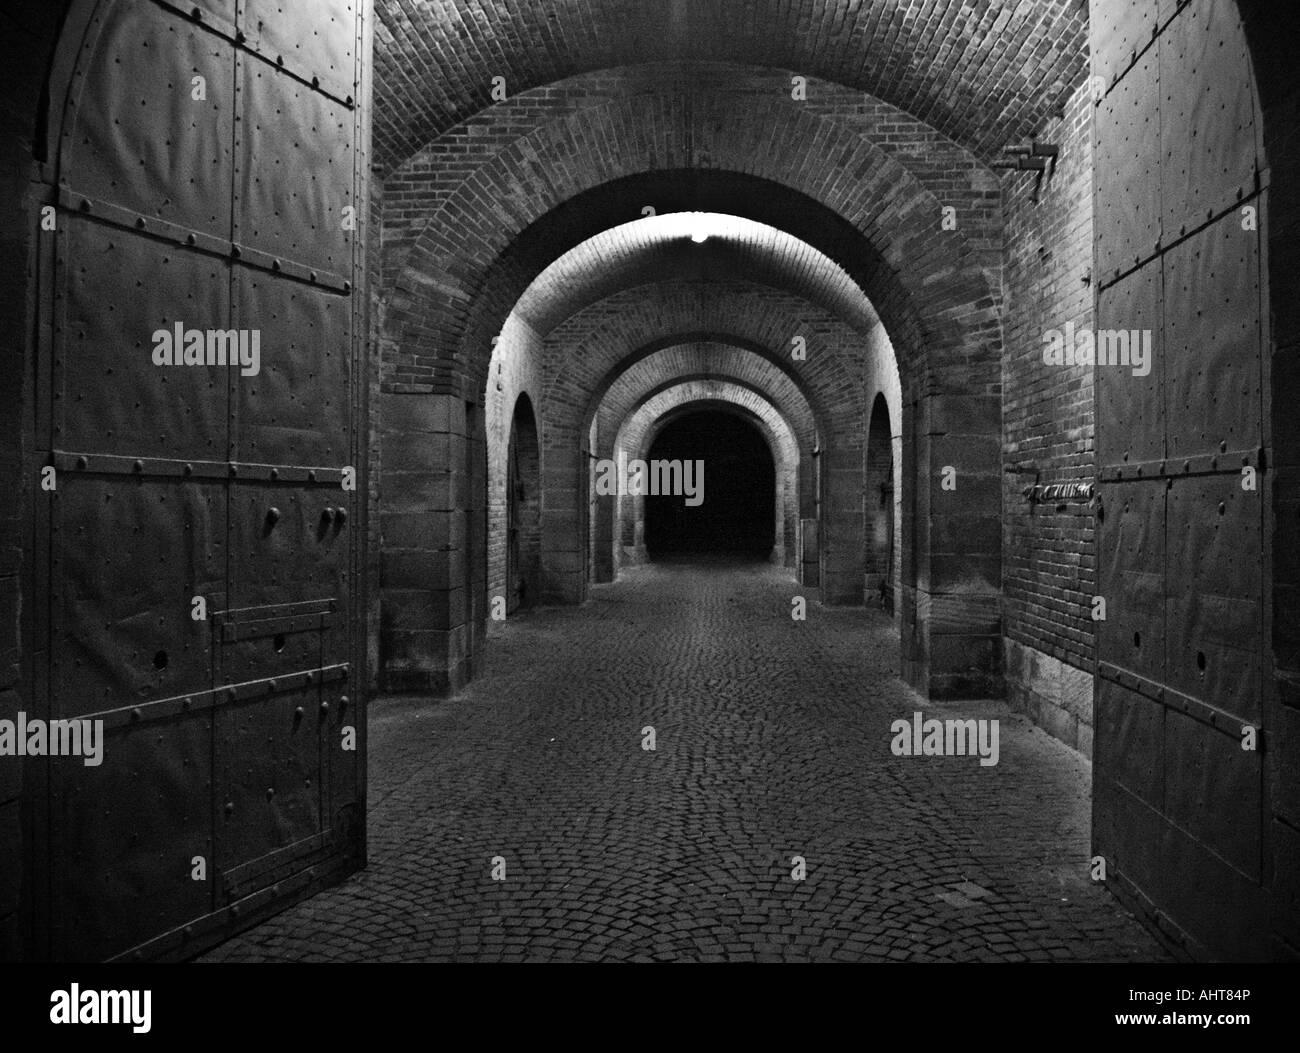 the way throug an old bastion - Stock Image